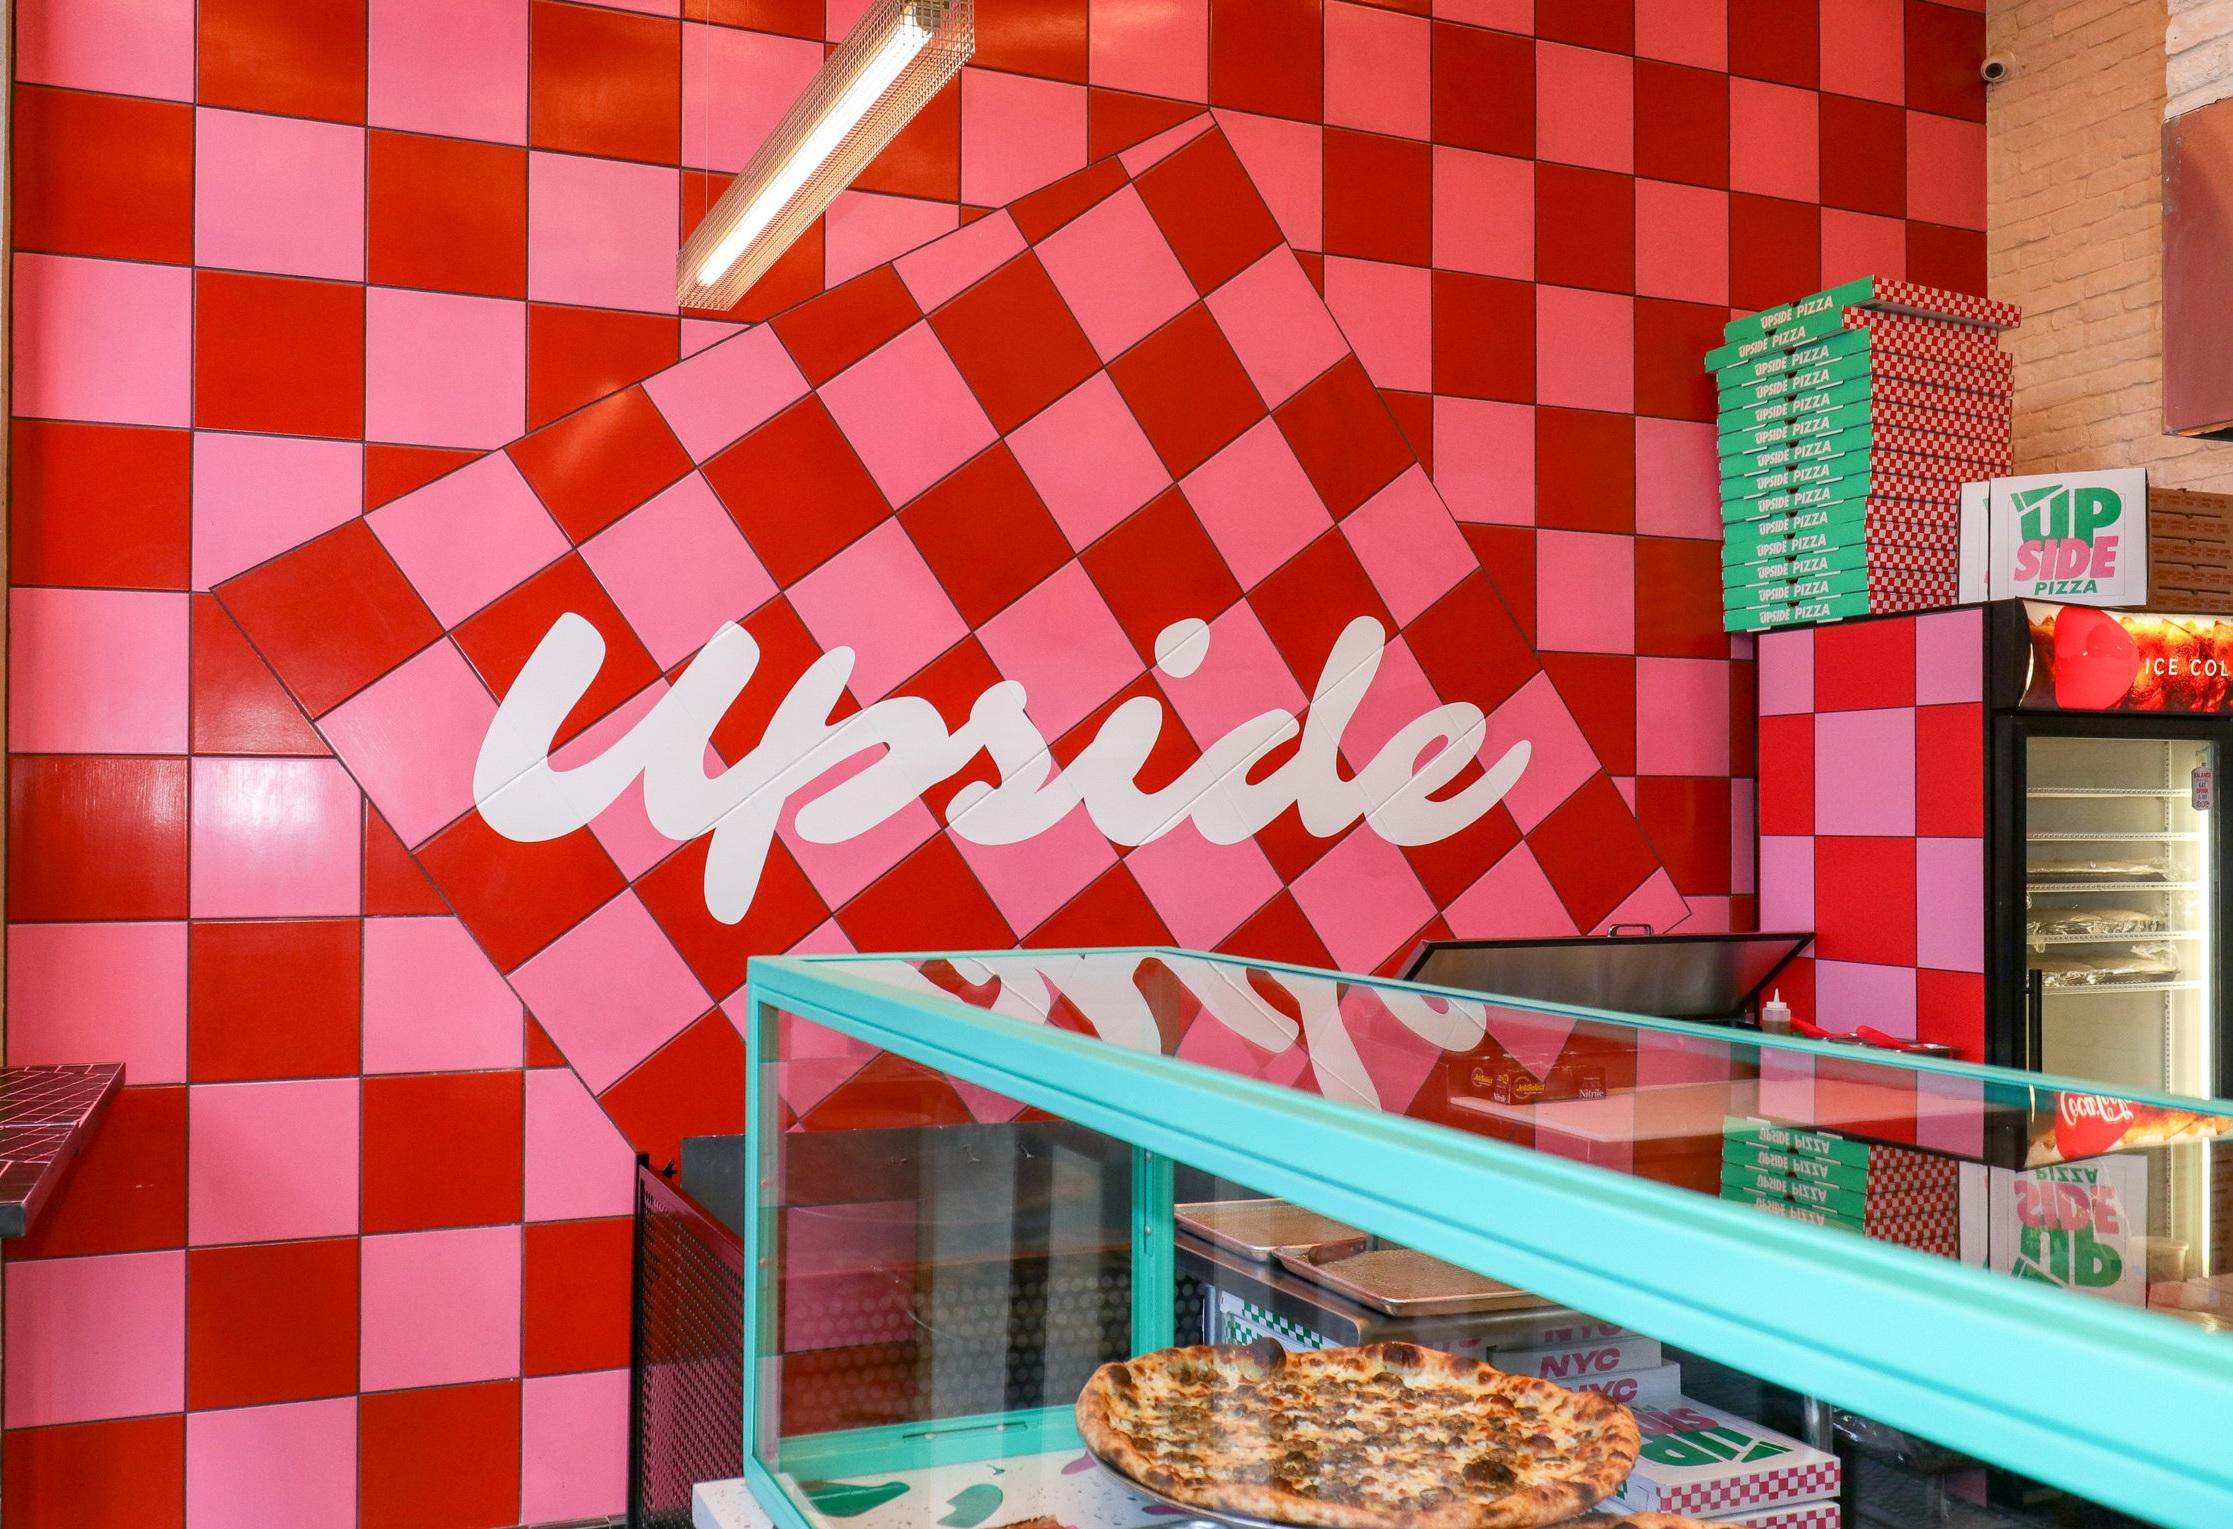 Upside-Pizza-Bolt-Design-Group-NYC-Hospitality-01